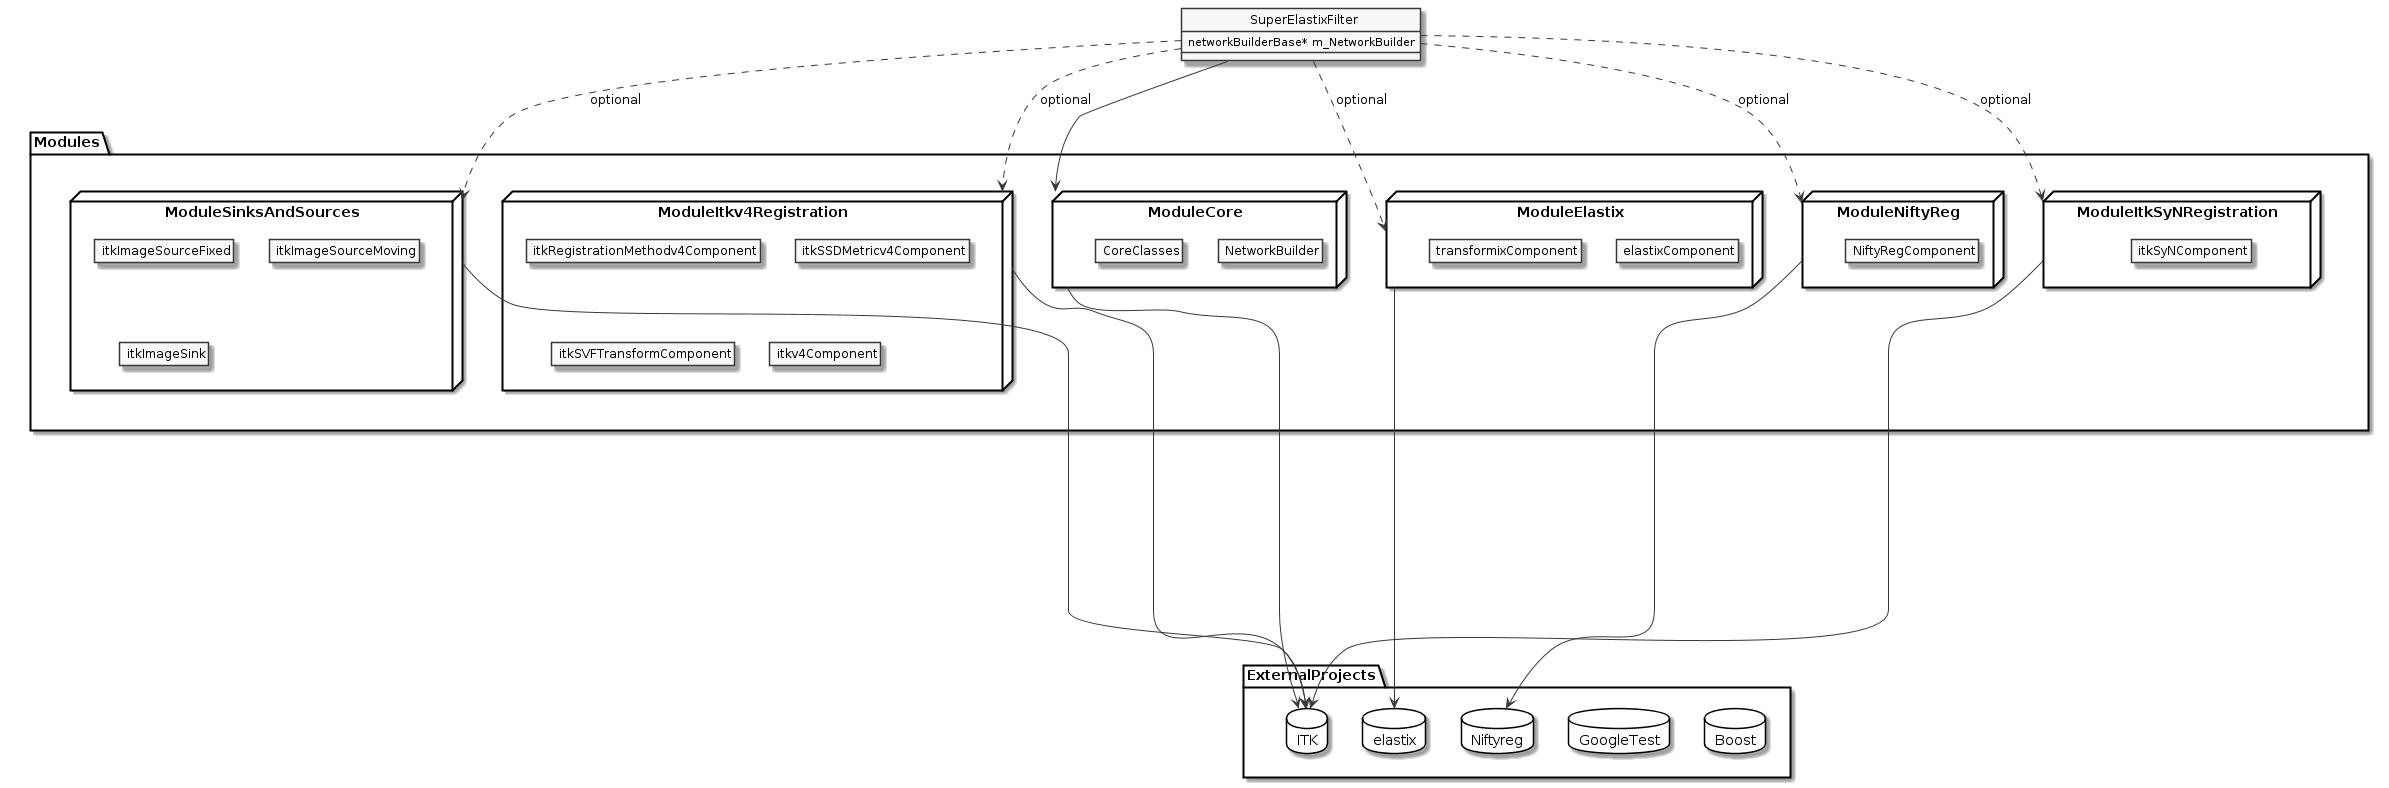 User Component Creation — SuperElastix 1 0 documentation